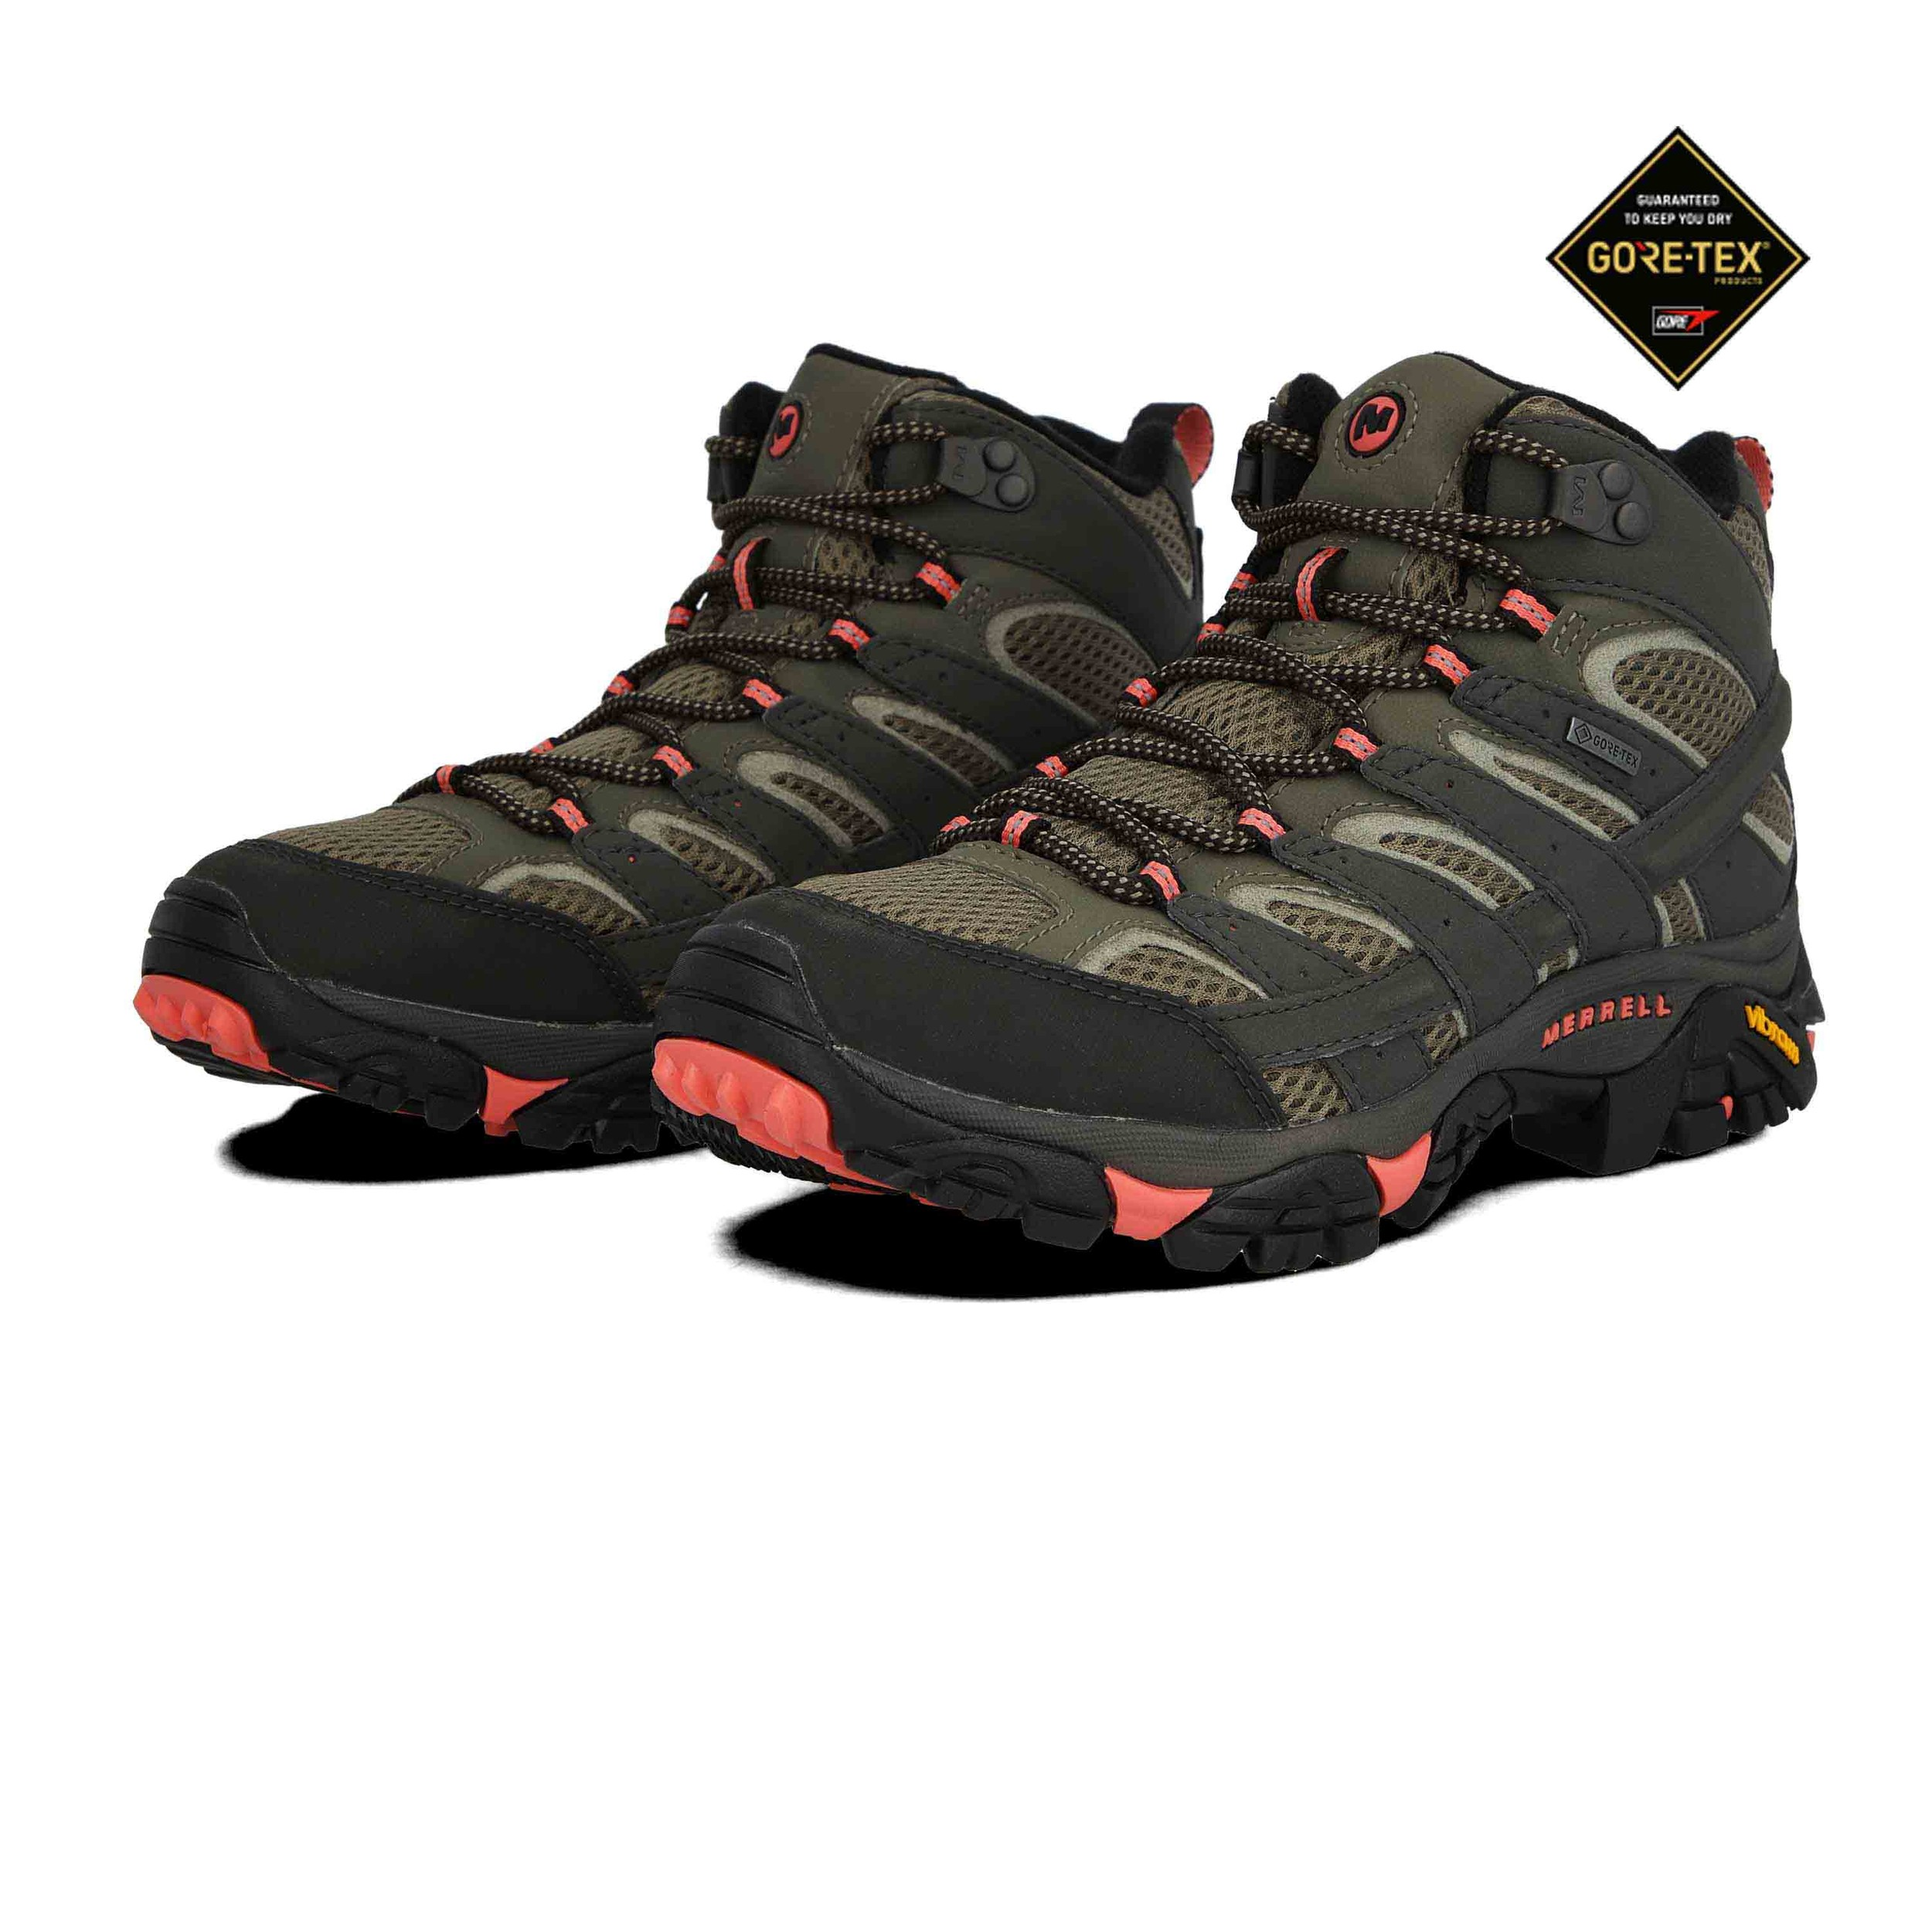 Merrell MOAB 2 Mid GORE-TEX Women's Walking Boots - AW20